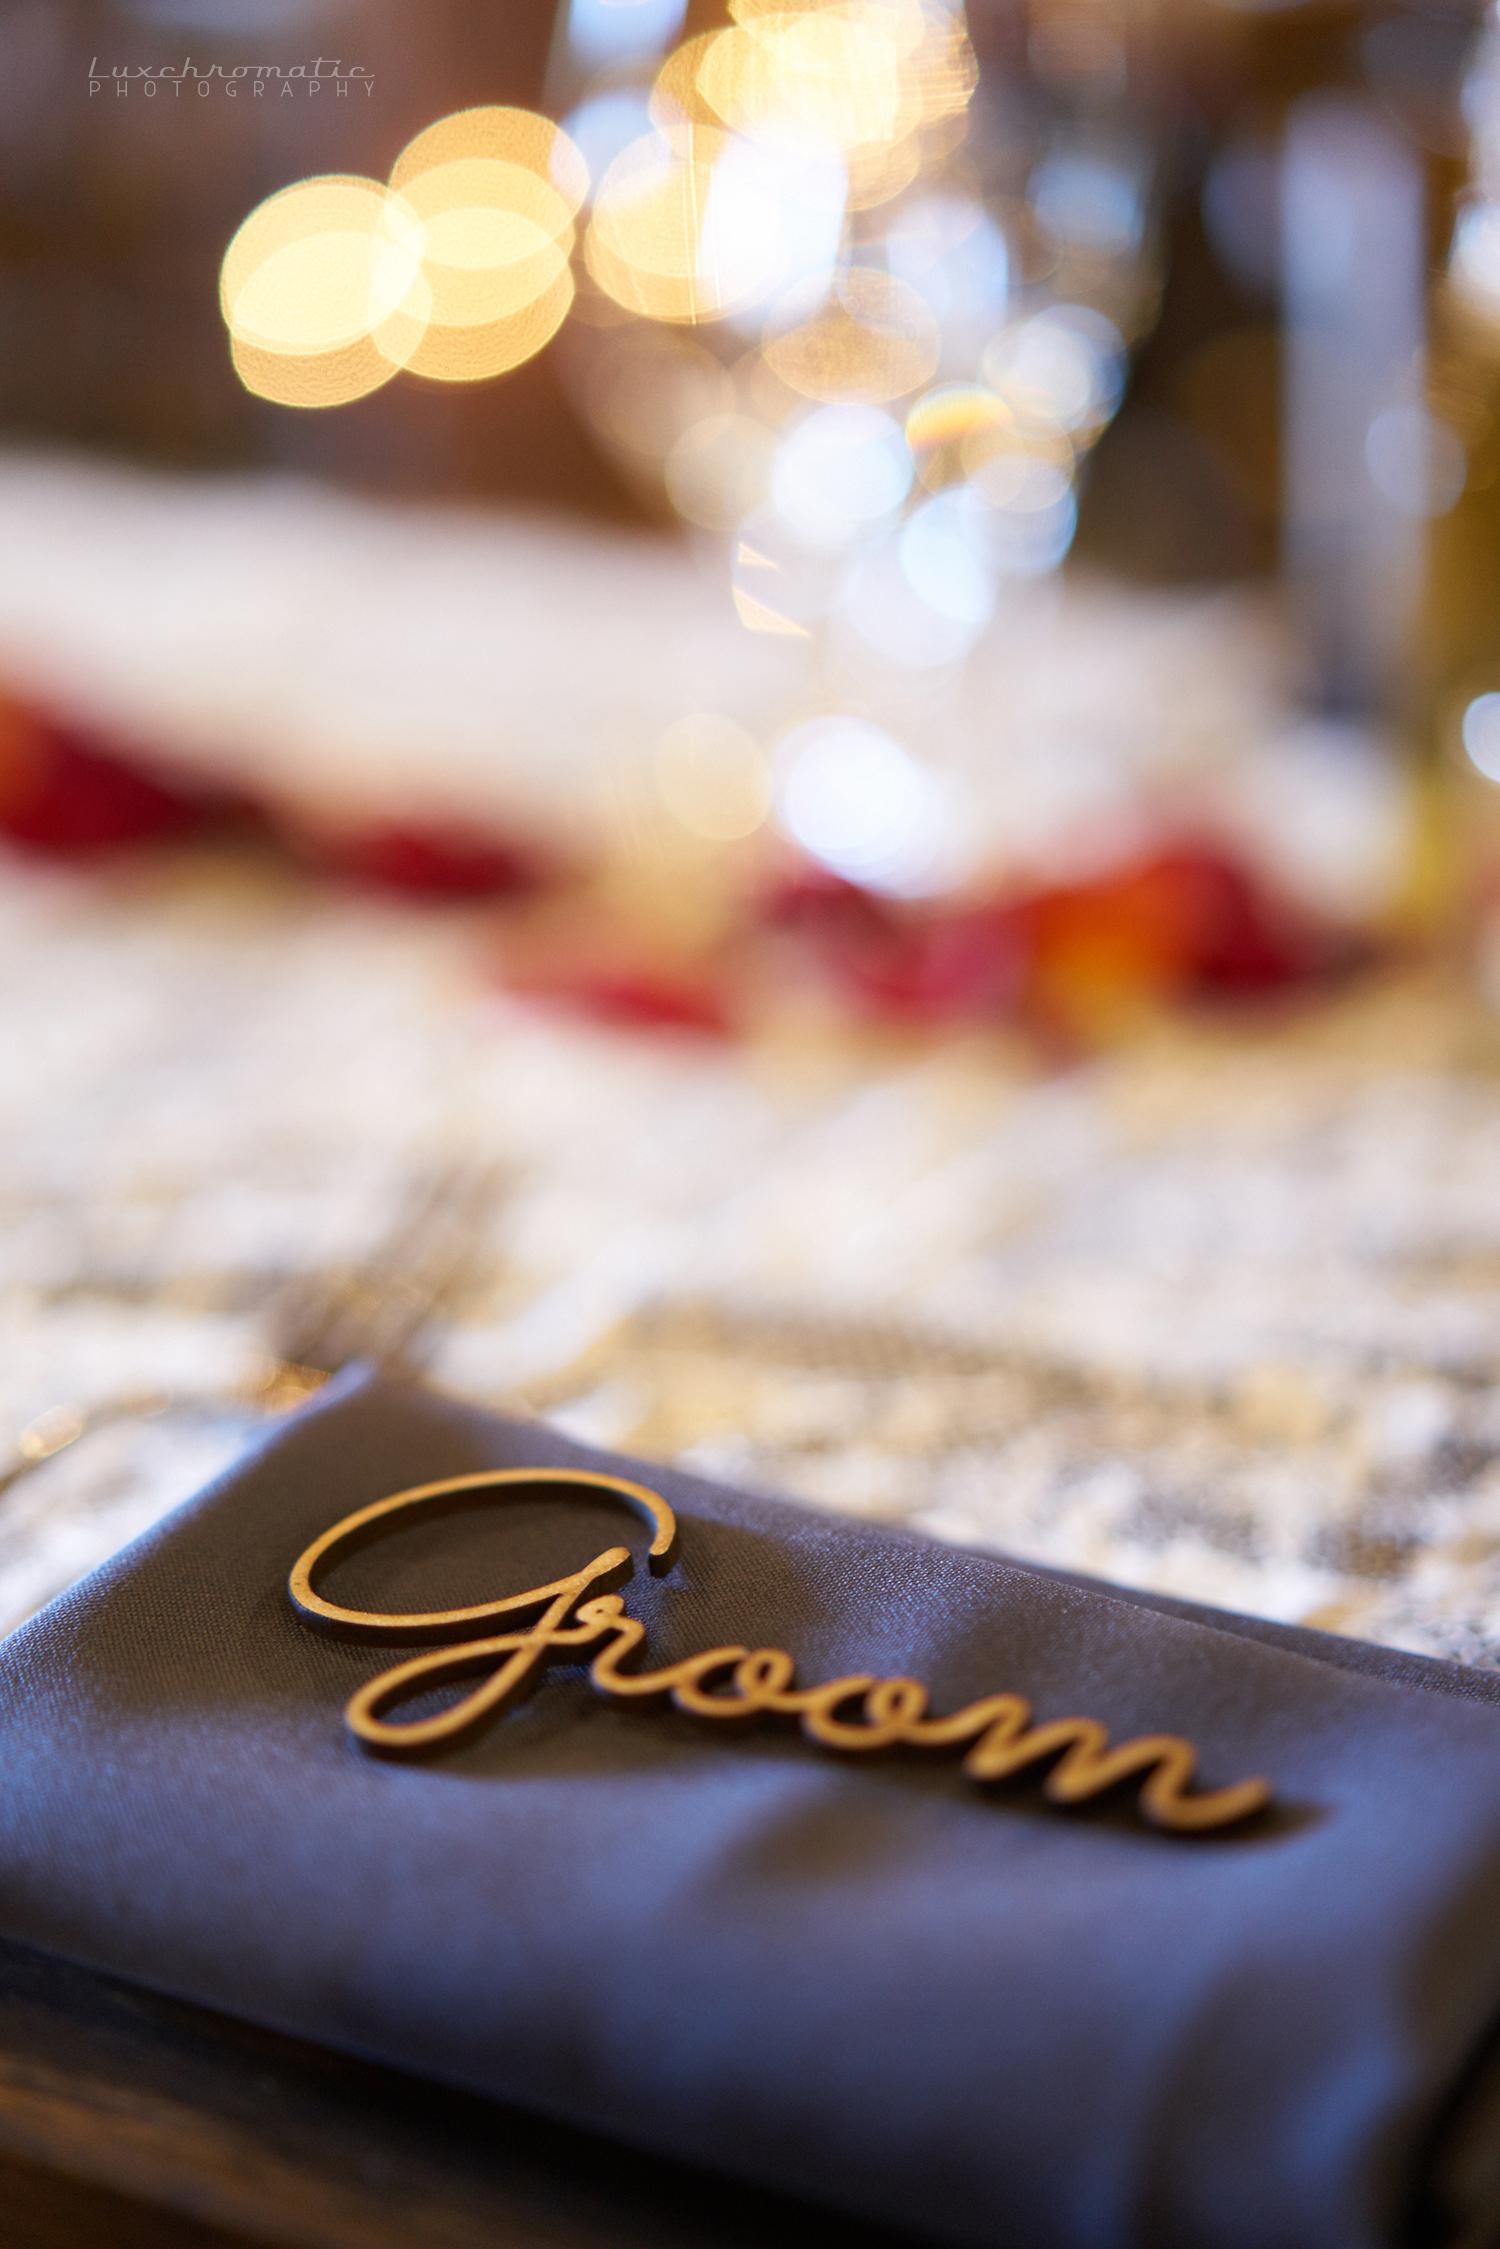 081217_Rachel_Chris_a0265-weddingdress-bride-weddingphotography-weddingphotographer-bridal-groom-wedding-engagementring-proposal-brides-diamondring-sonyalpha-sony-sonya9-sonya7rii-sanfrancisco-sf-bayarea-photographer-profoto-murrietas-well.jpg